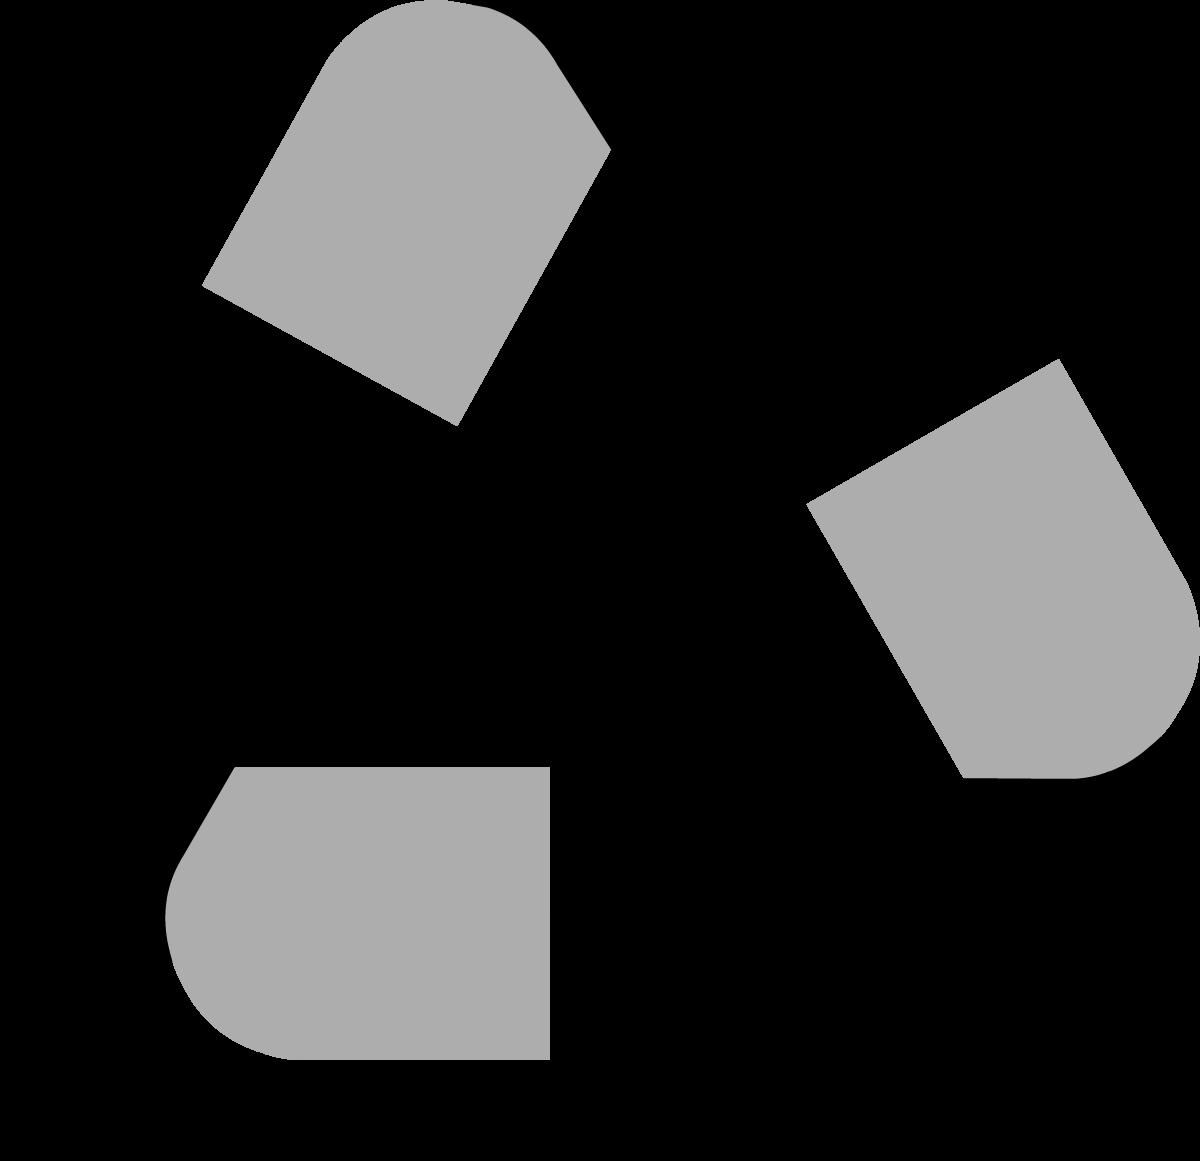 clip art transparent stock Download symbol the original. Recycling drawing color